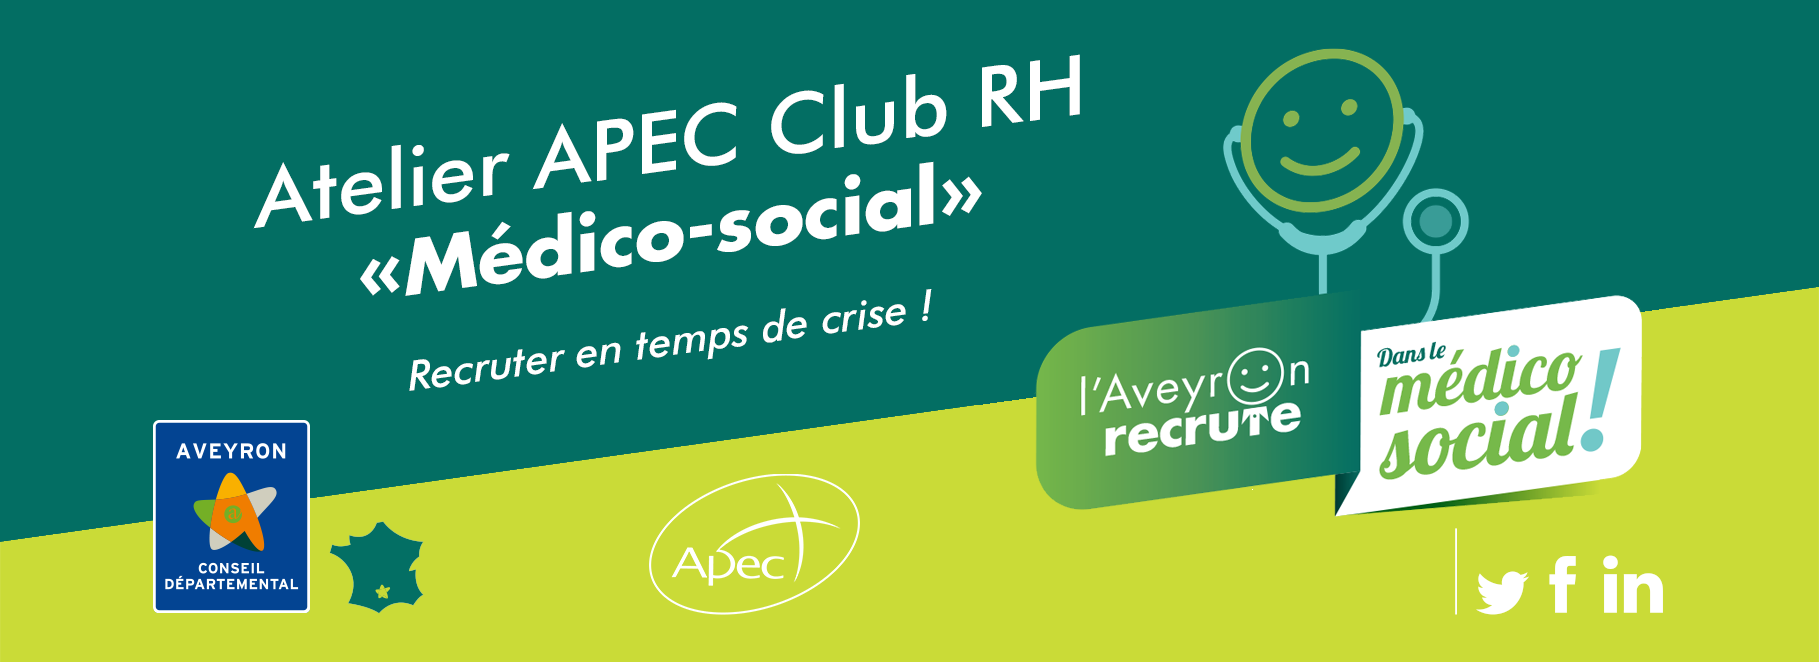 WEBINAIRE Club RH MEDICO-SOCIAL